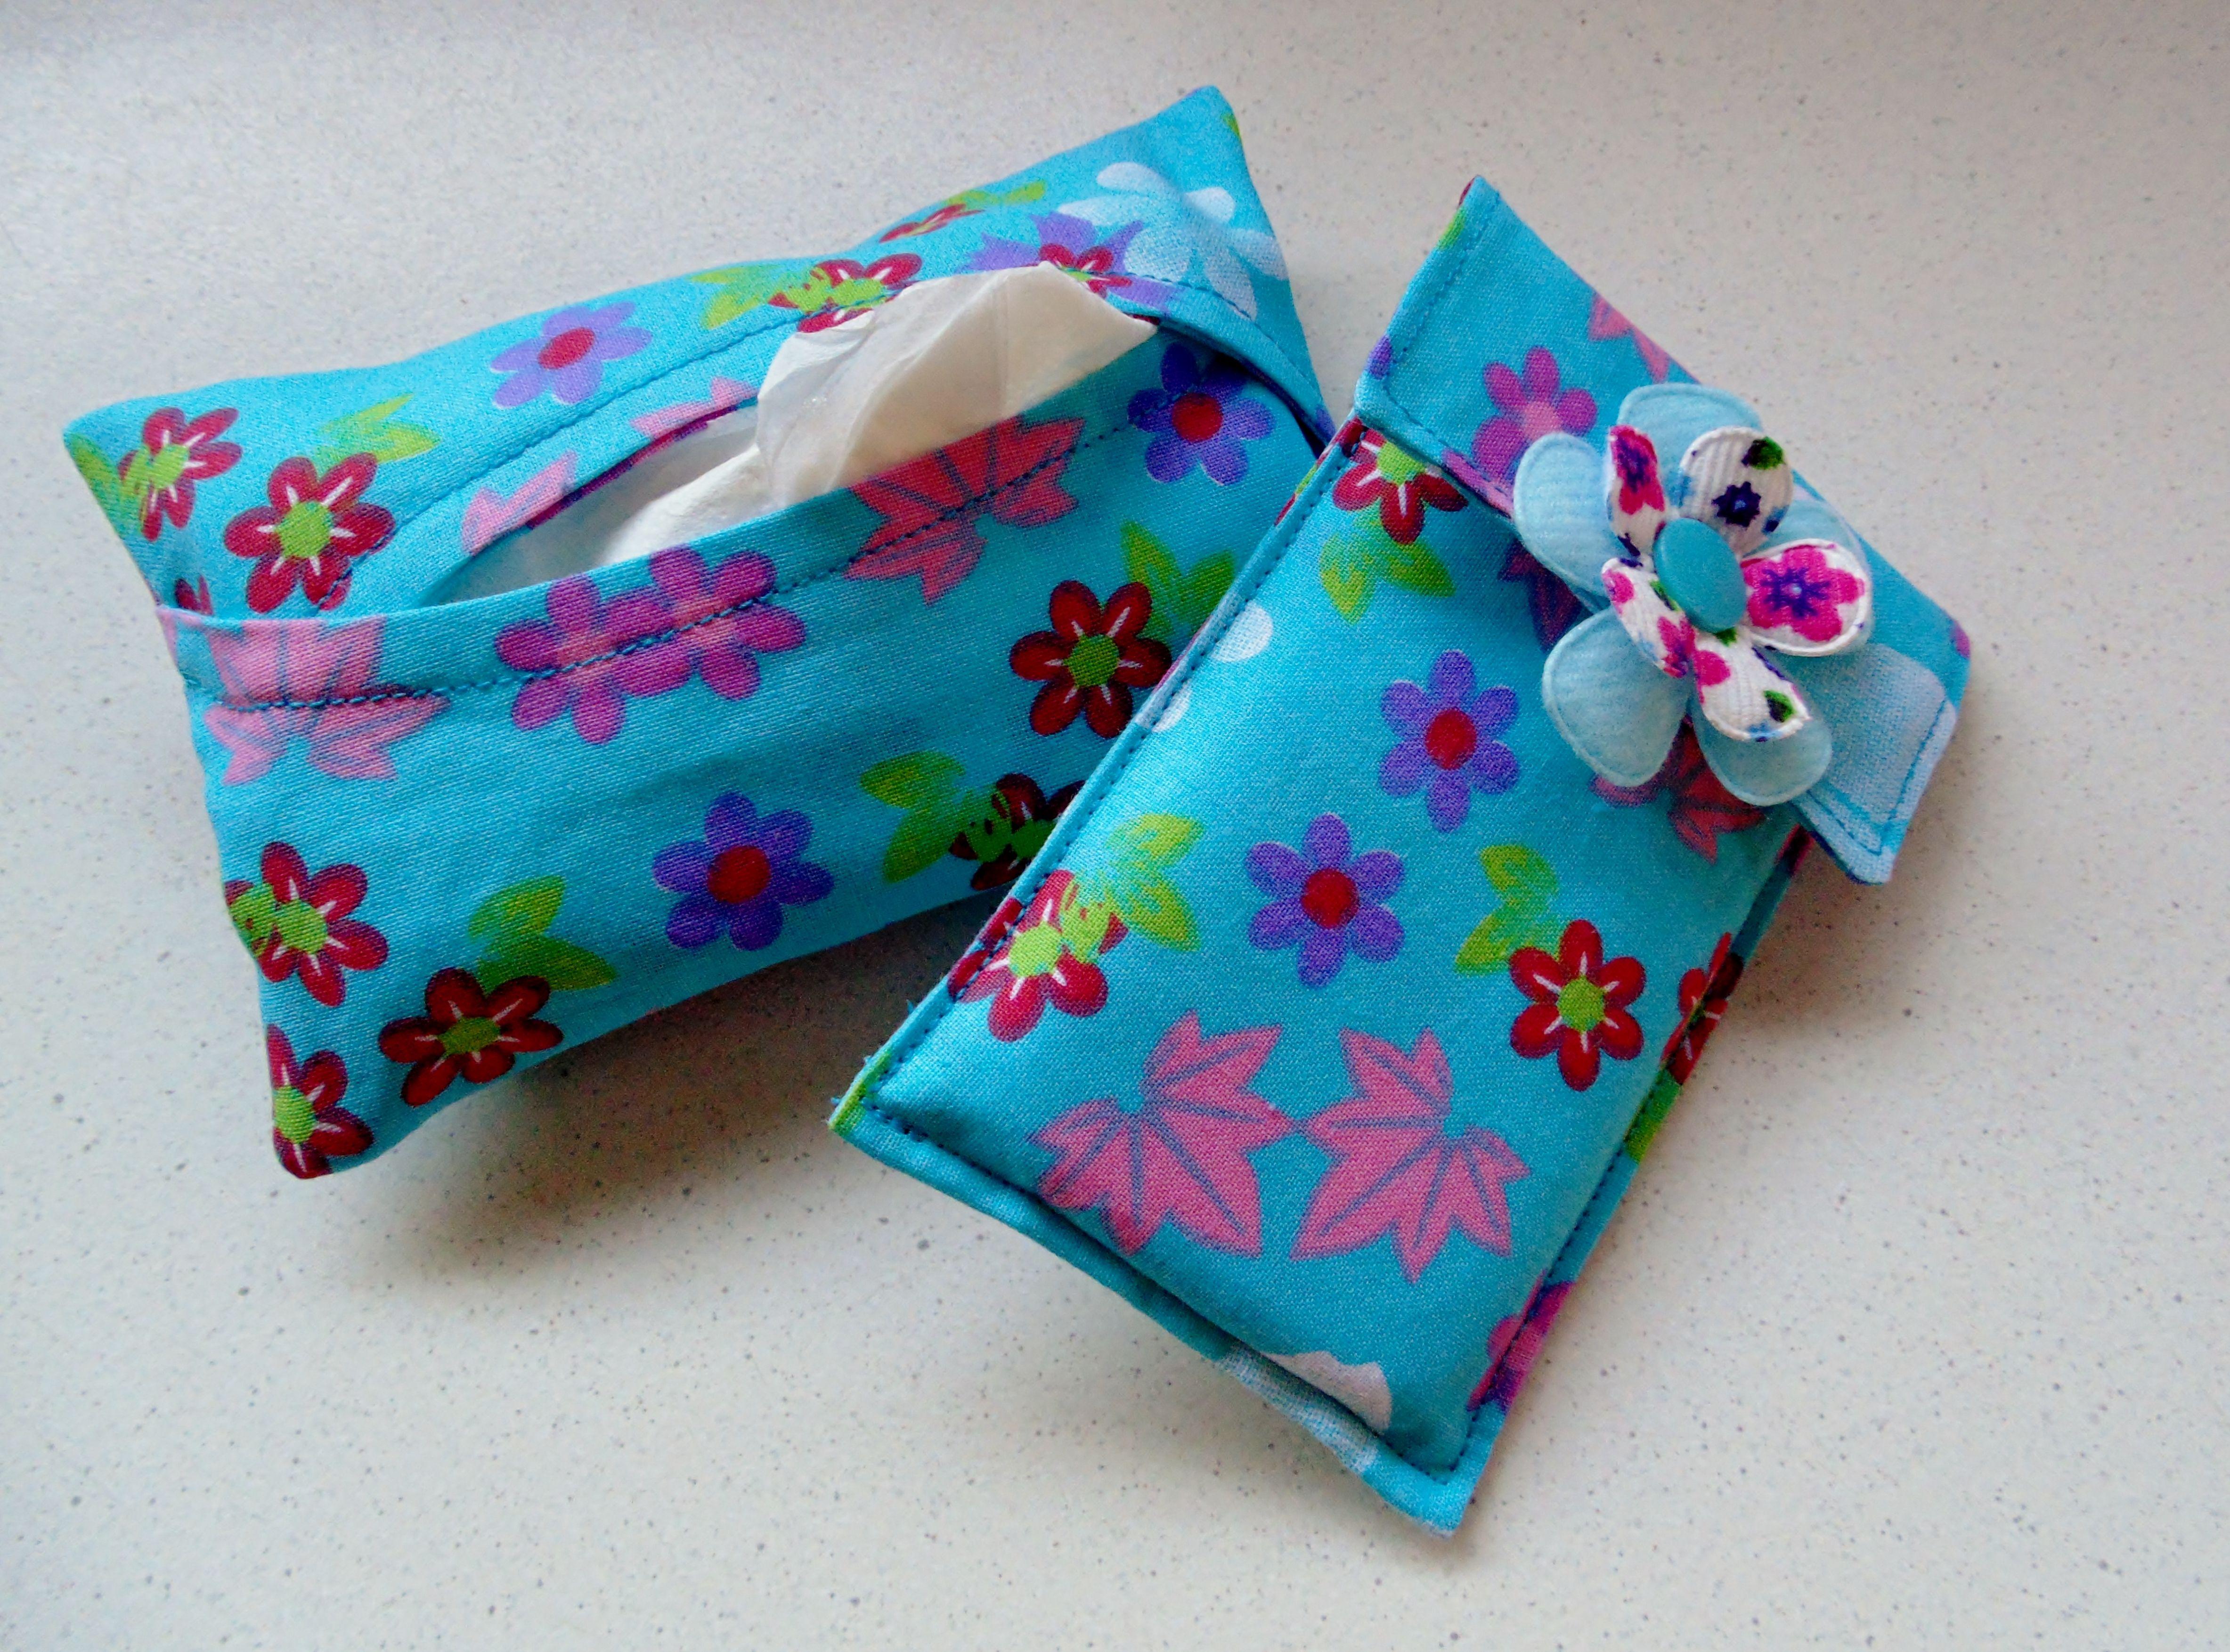 Gsm hoesje en zakdoekjes hoesje kleine cadeaus zelf for Kleine vijverfilter zelf maken